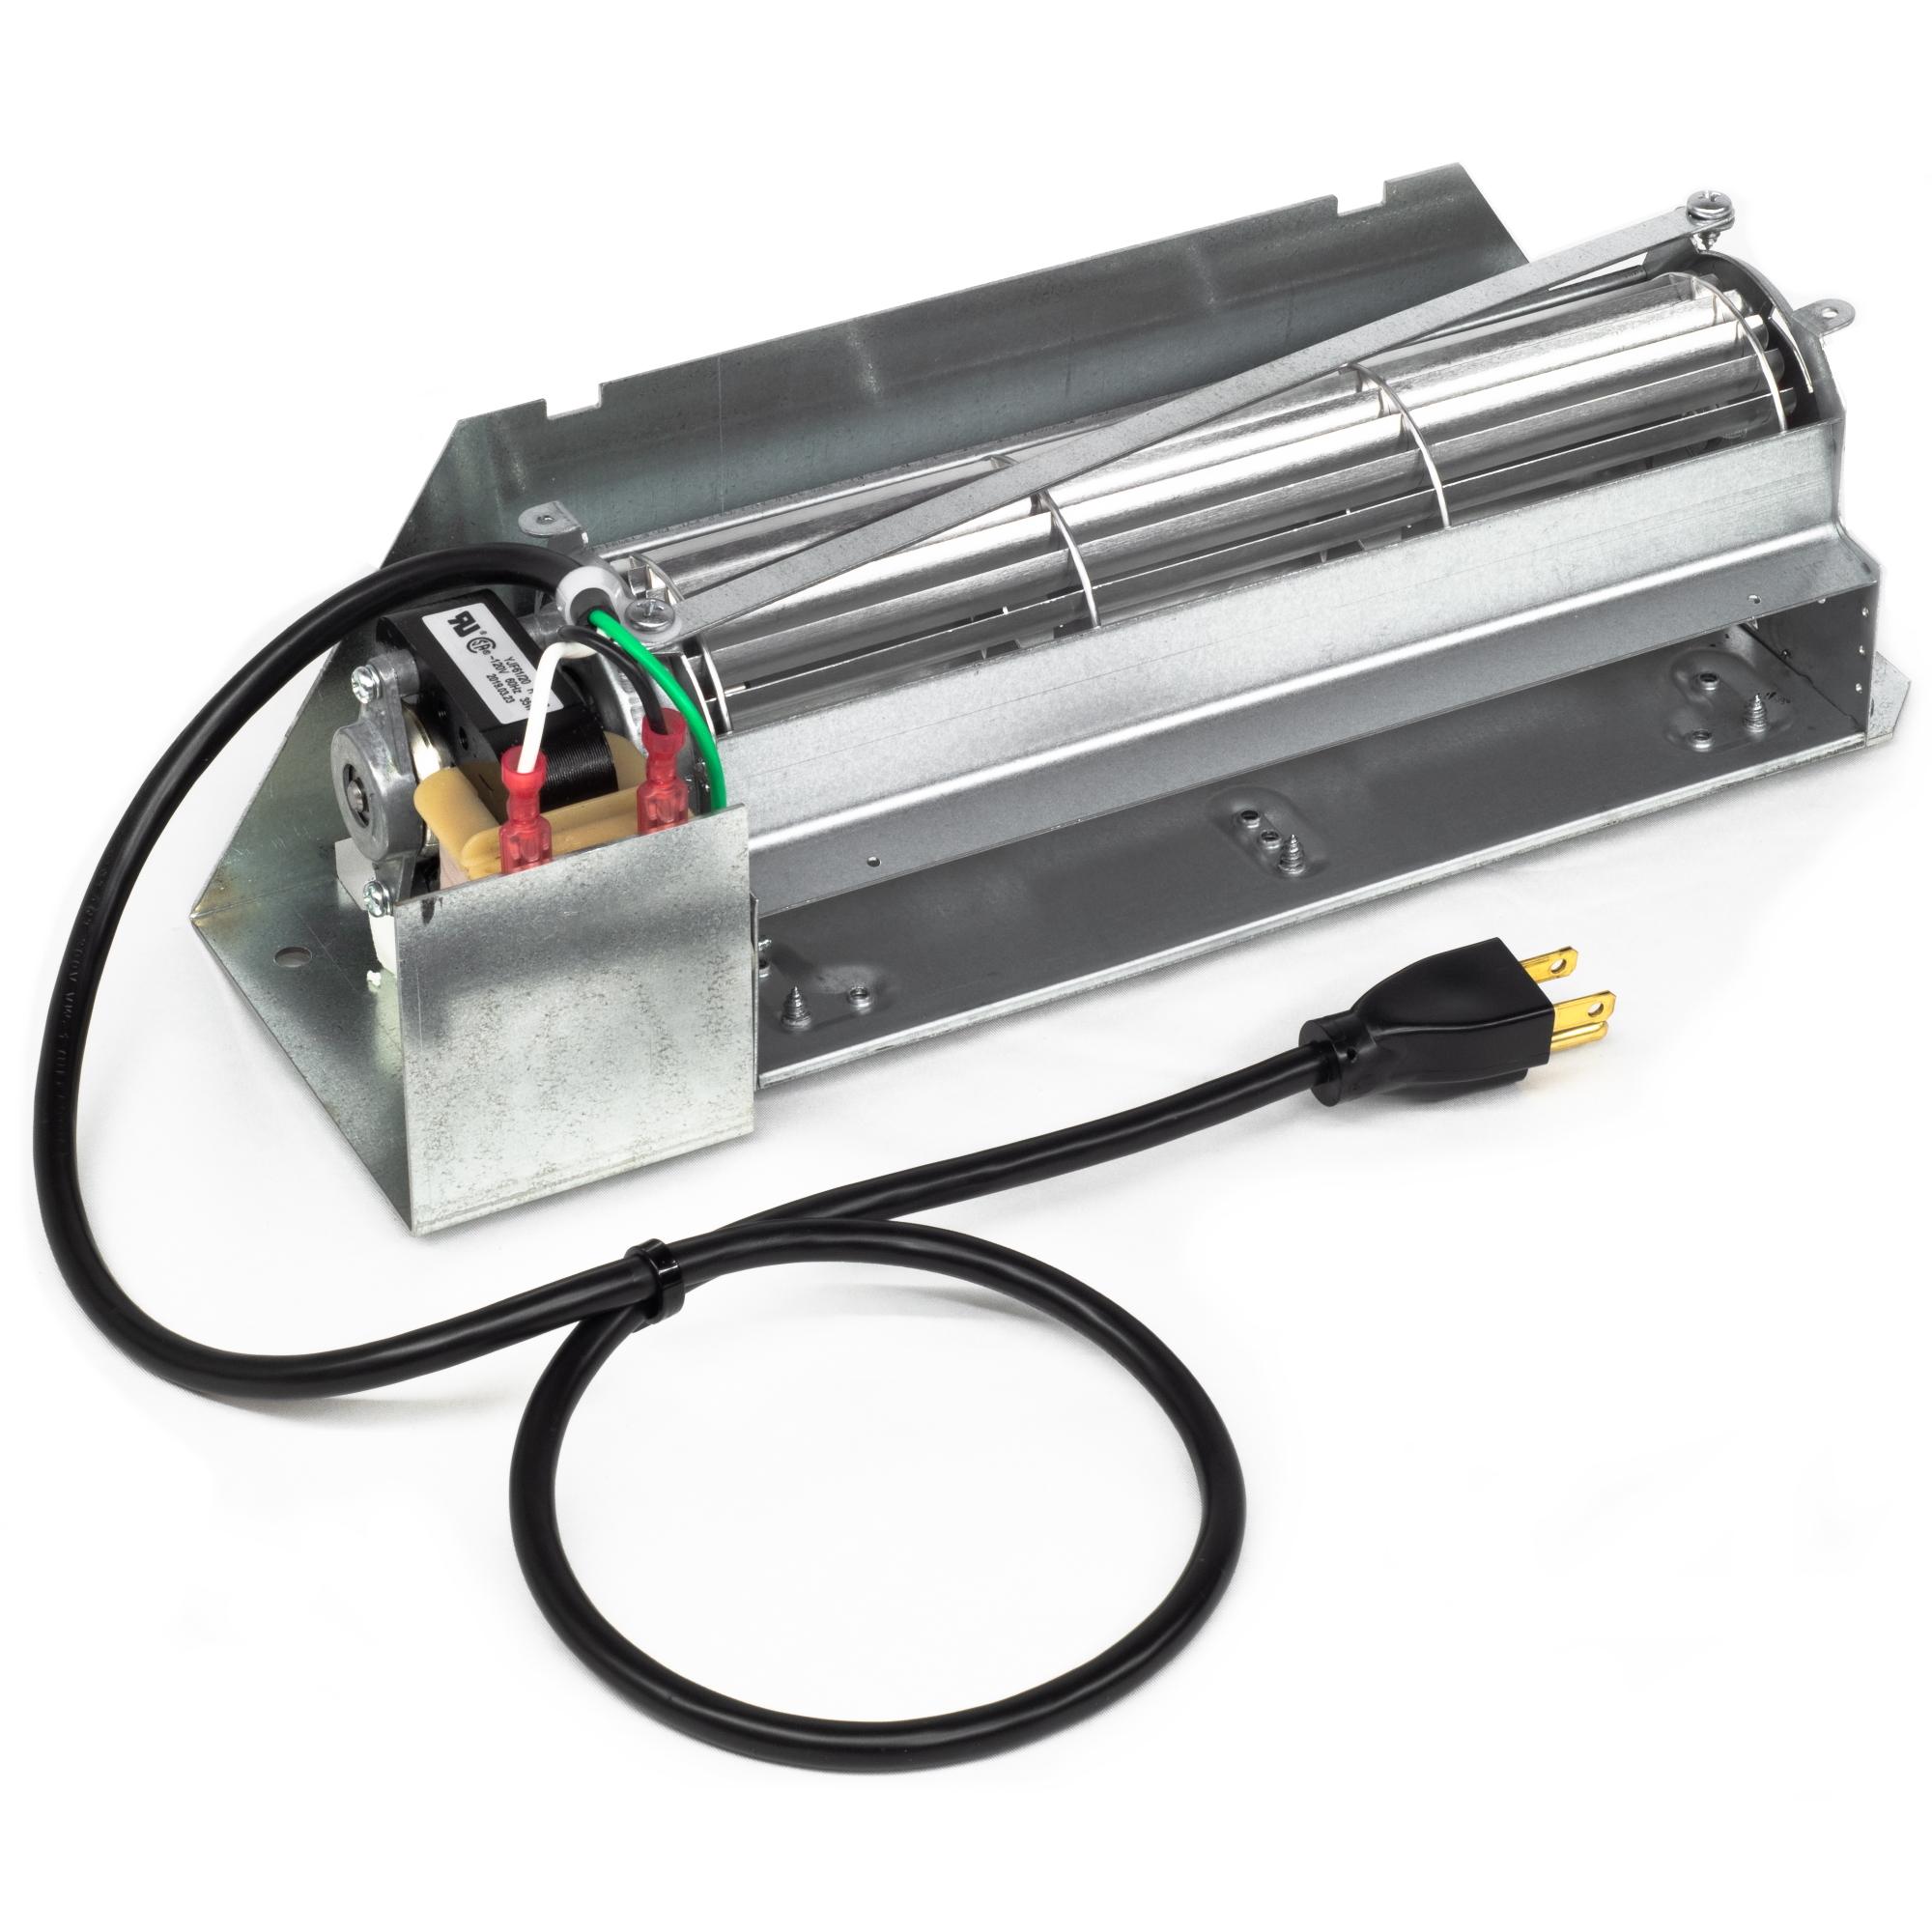 FBK-100 Fireplace Blower Kit for Astria, Lennox & Superior Fireplaces